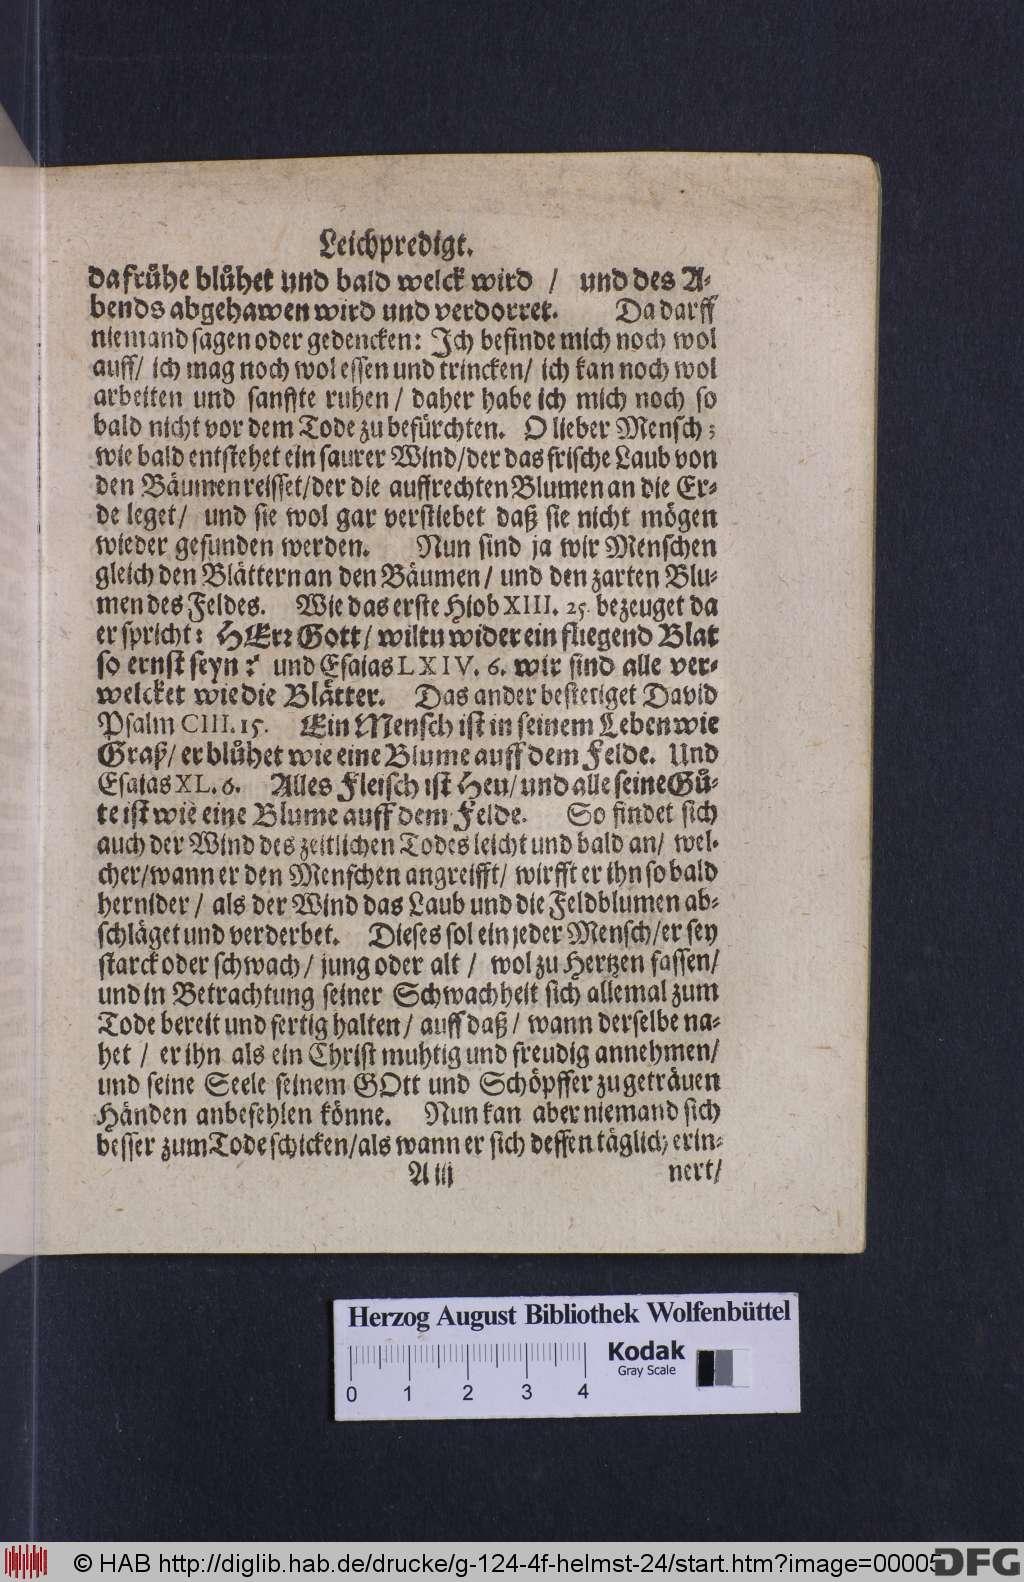 http://diglib.hab.de/drucke/g-124-4f-helmst-24/00005.jpg